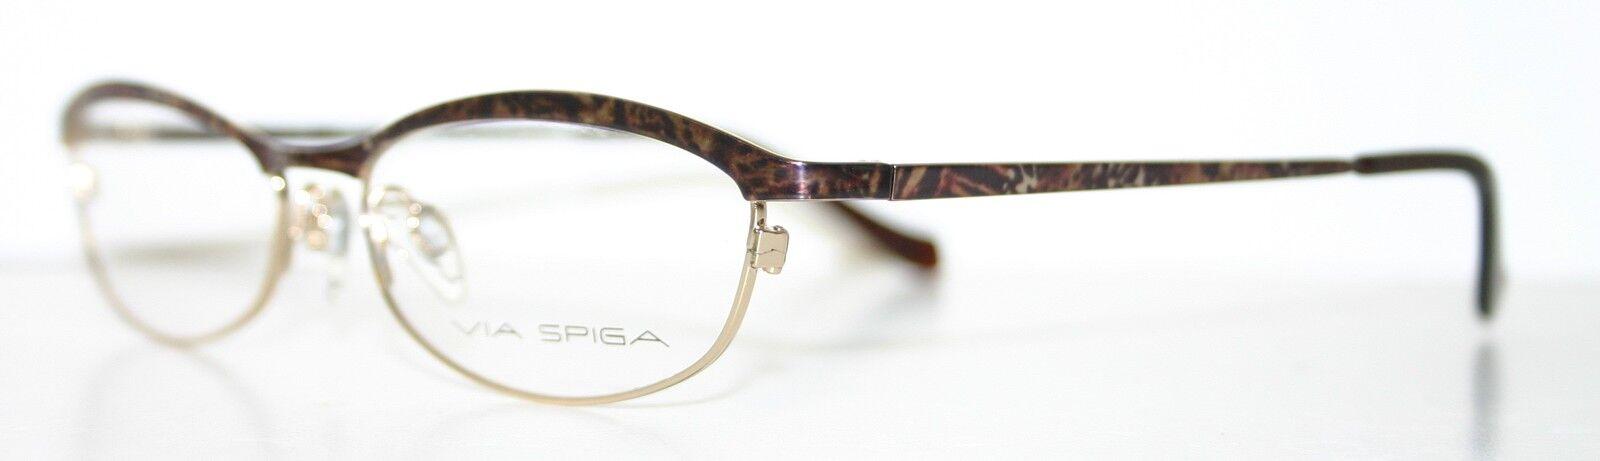 VIA SPIGA DARA SAFARI New Women\'s Optical Eyeglass Frame ...